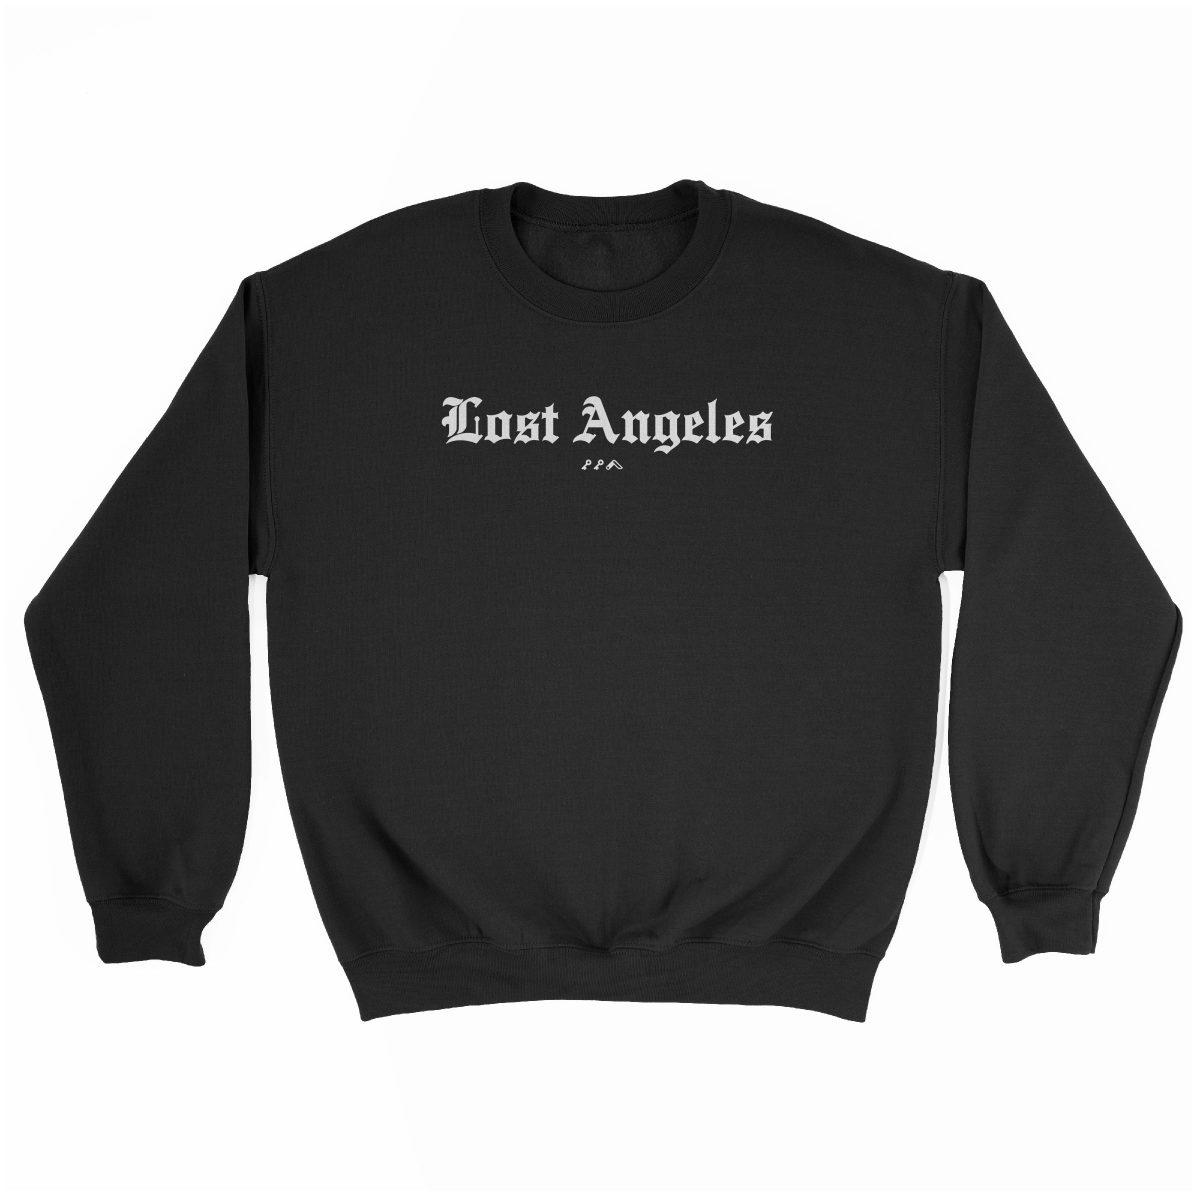 """Lost Angeles"" soft sweatshirt in black by KIKICUTT"